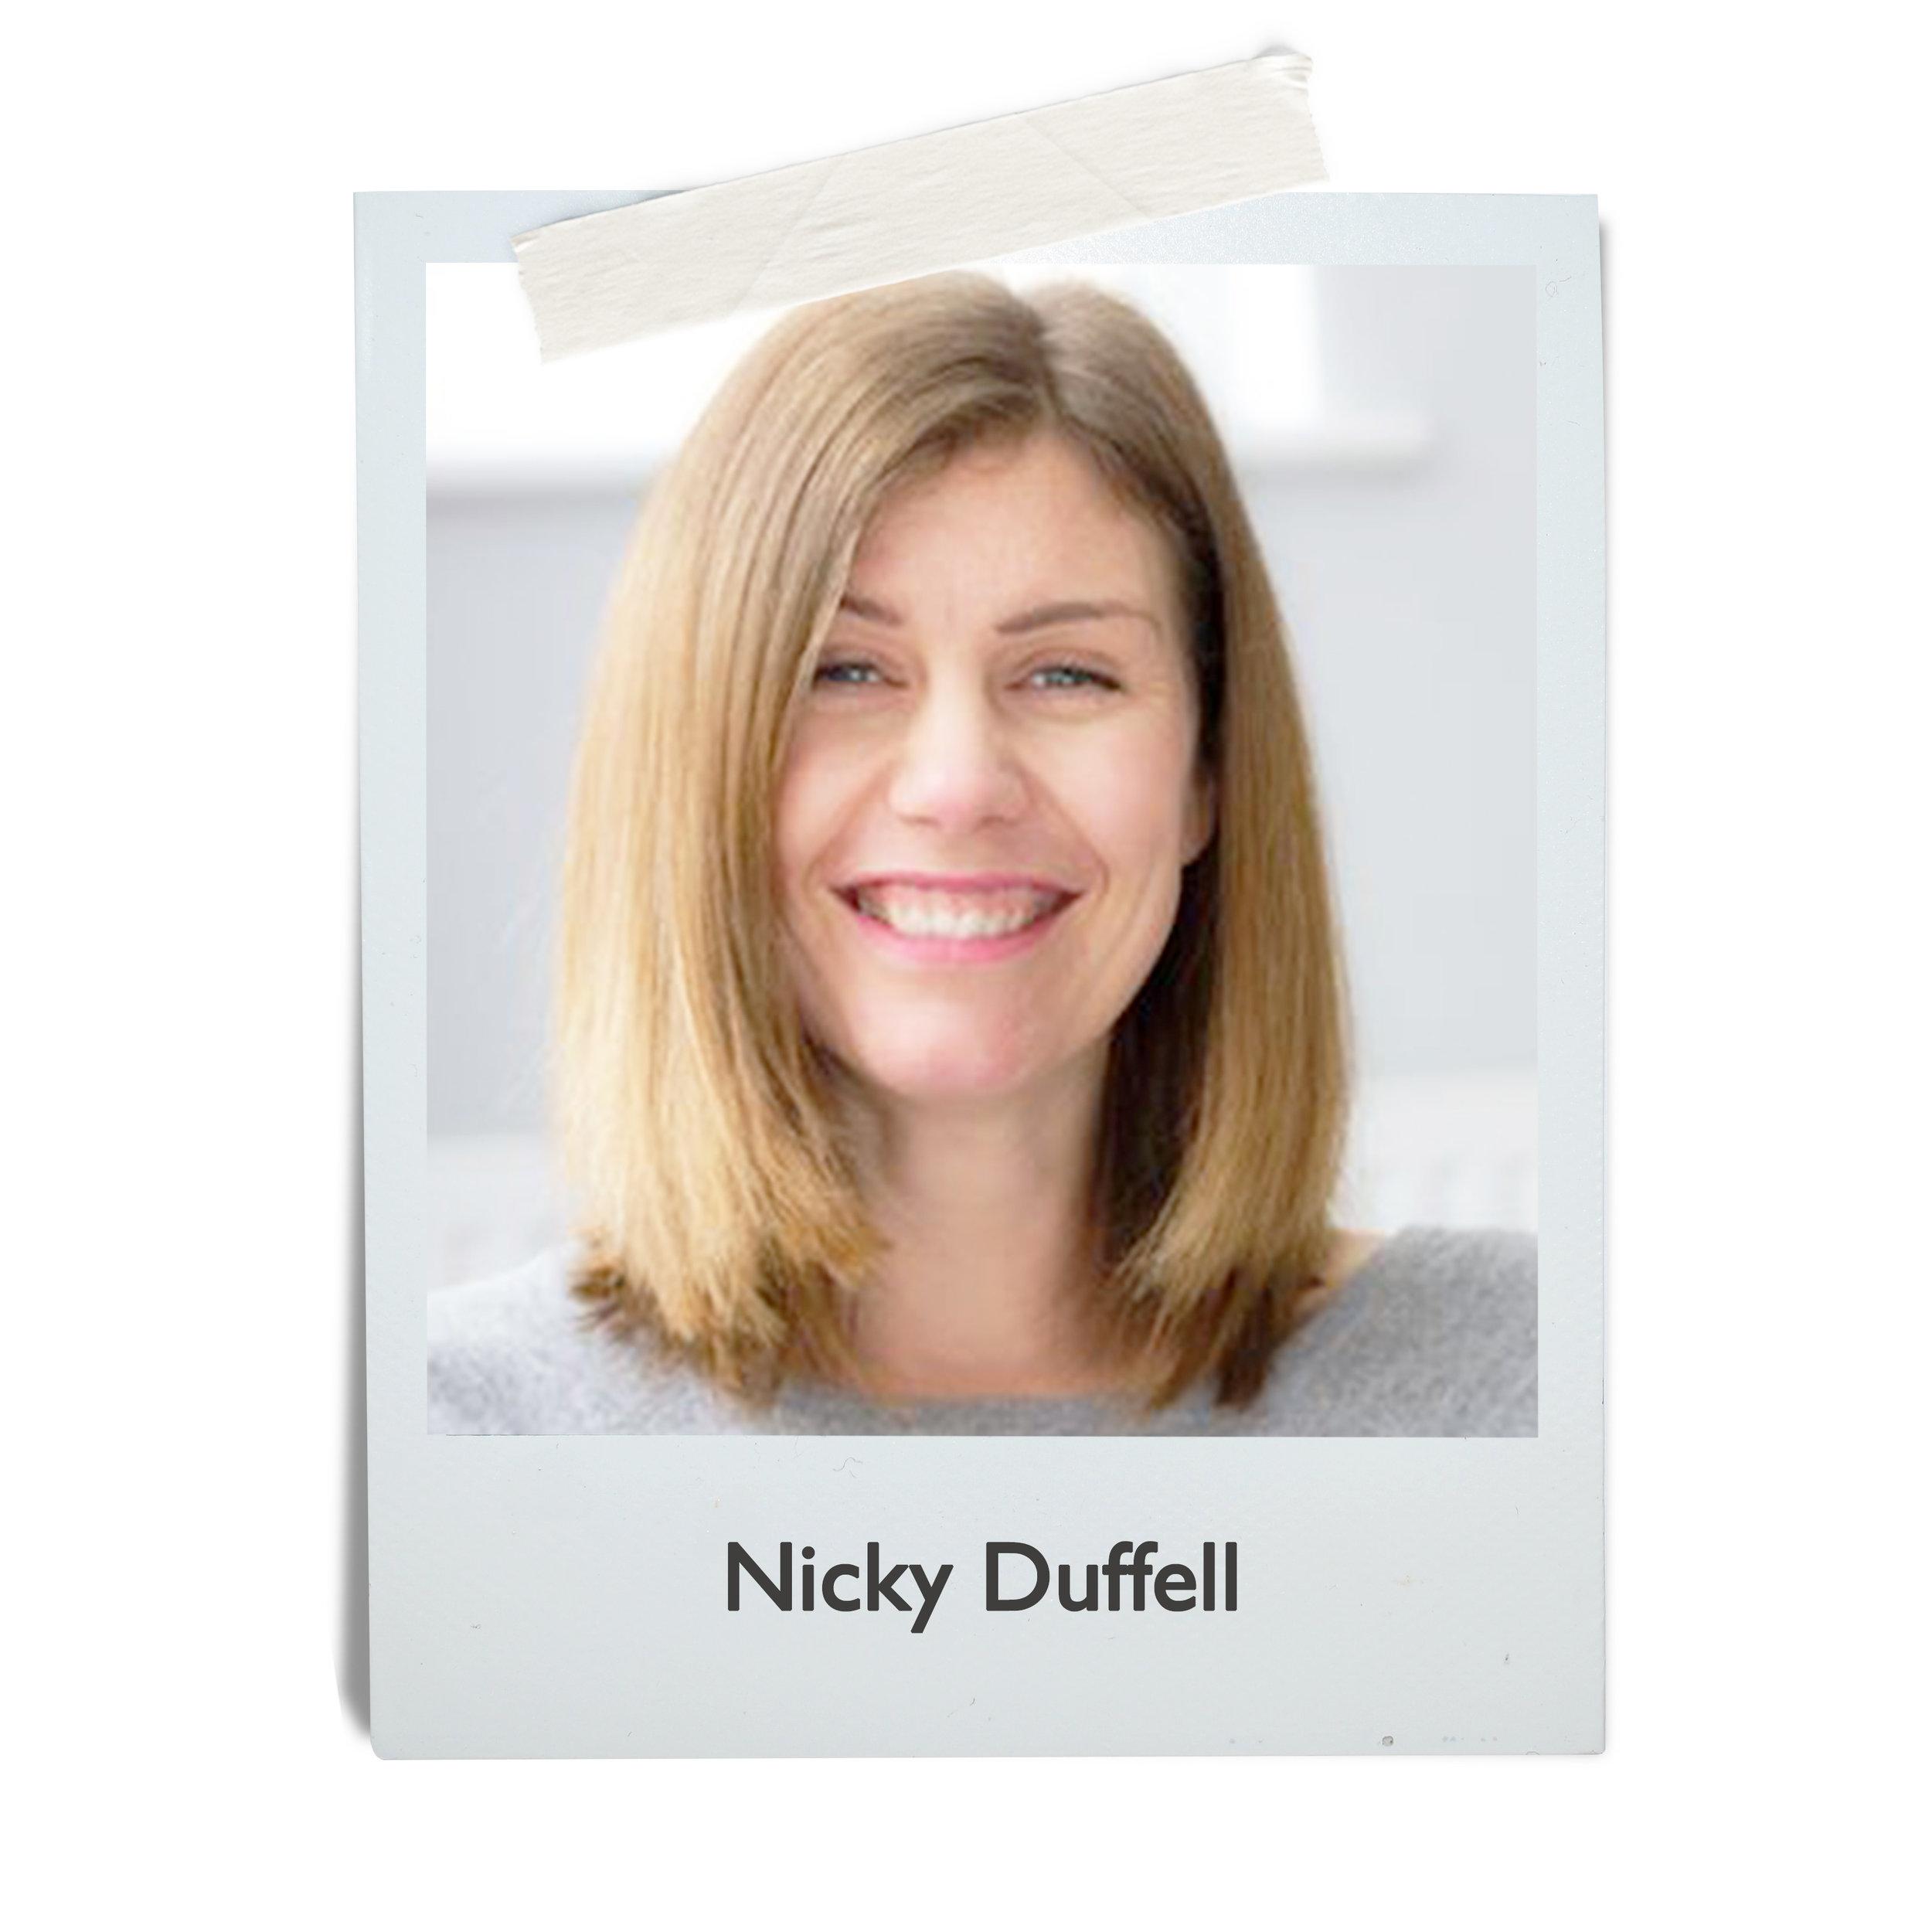 Nicky Duffell